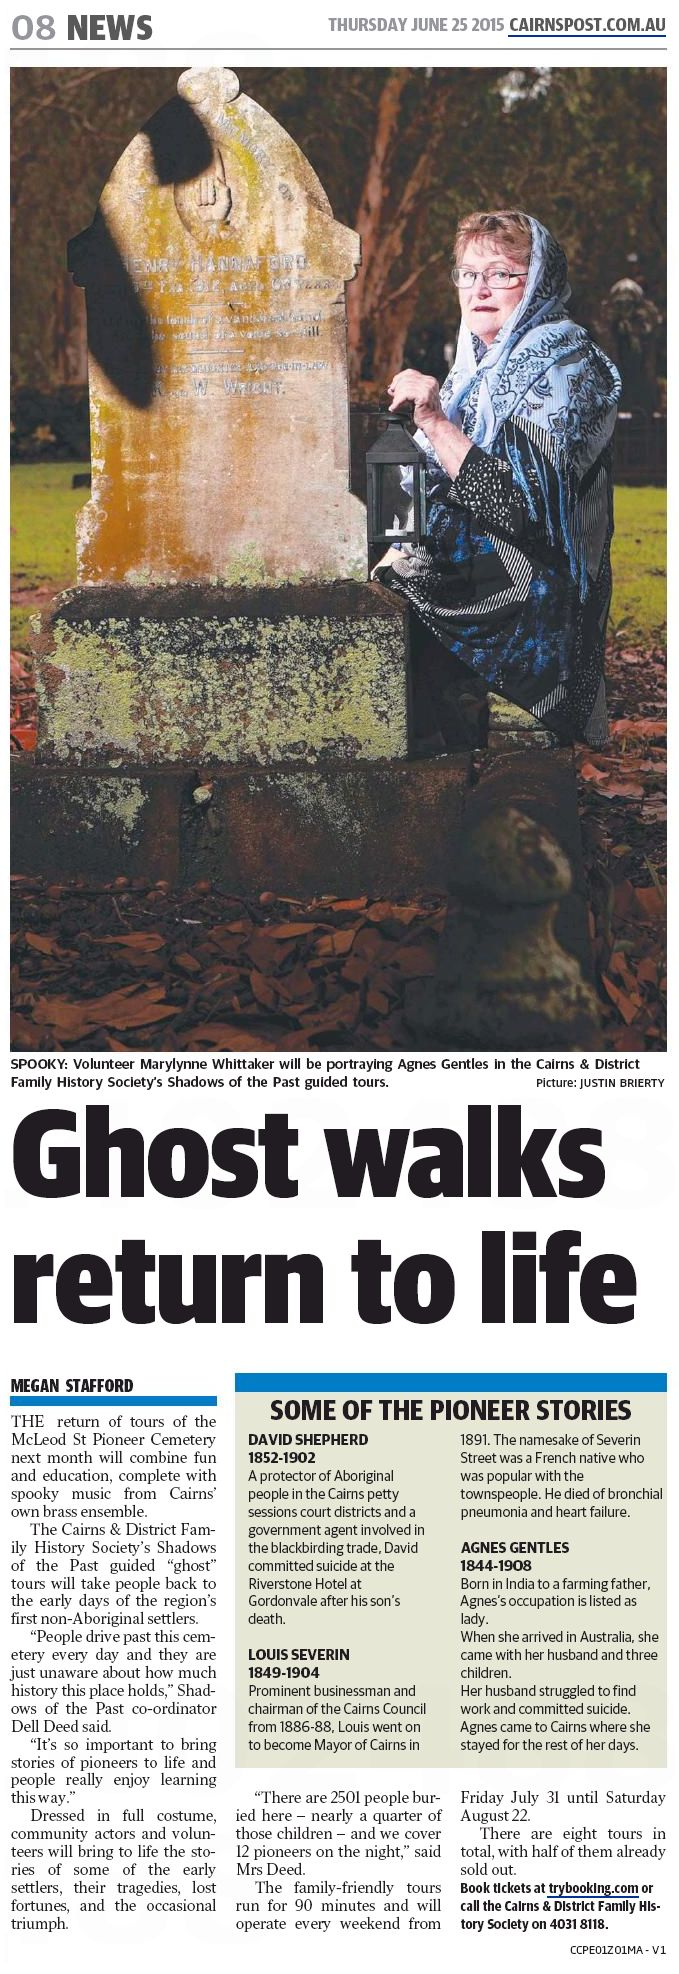 Ghost walks - The Cairns Post, 25 June 2015